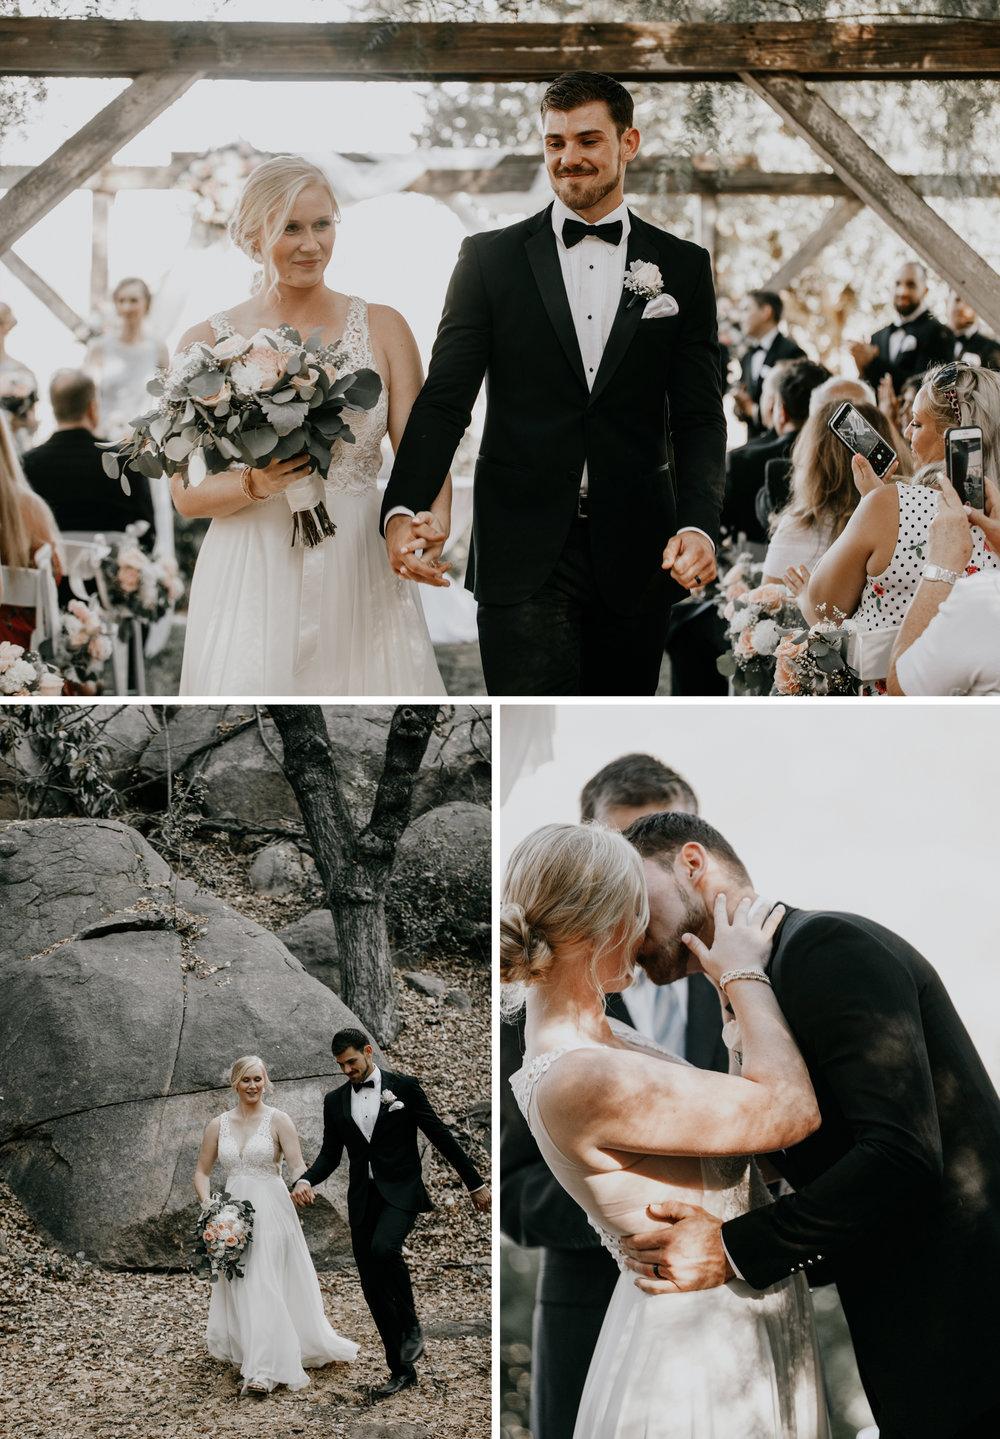 Southerncaliforniaweddingphotography